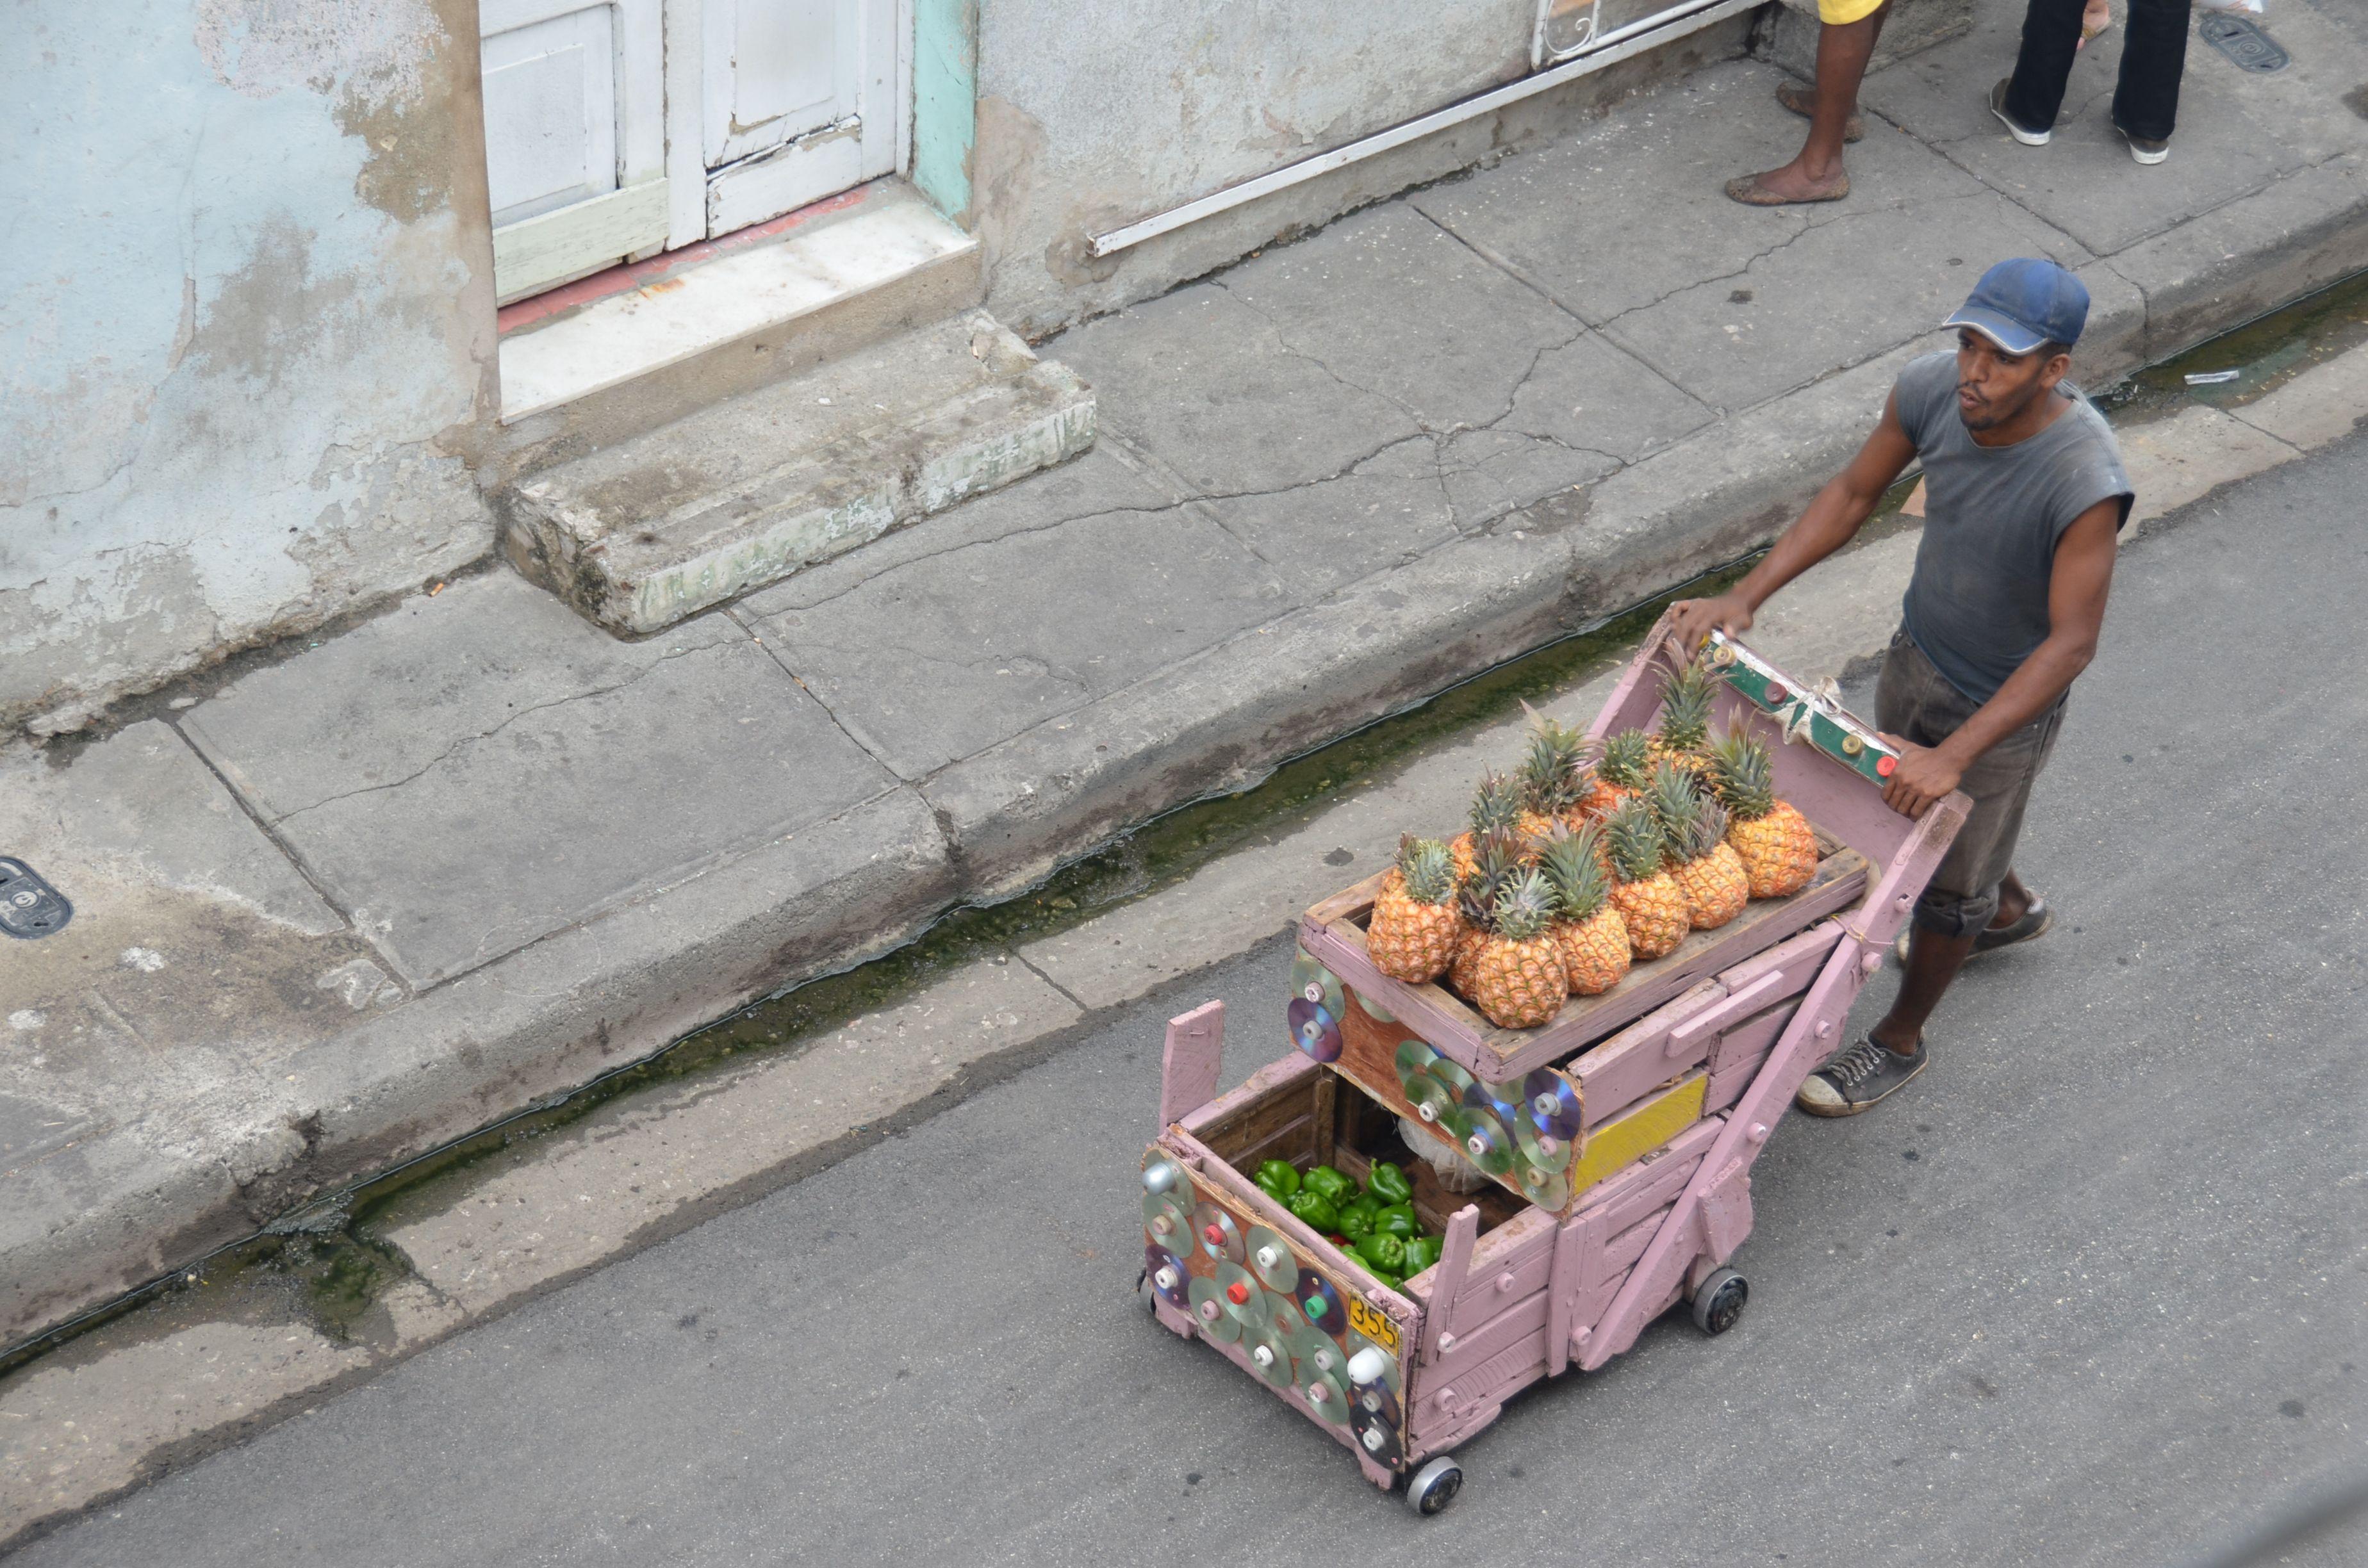 Straßenverkäufer in der Padre Pico